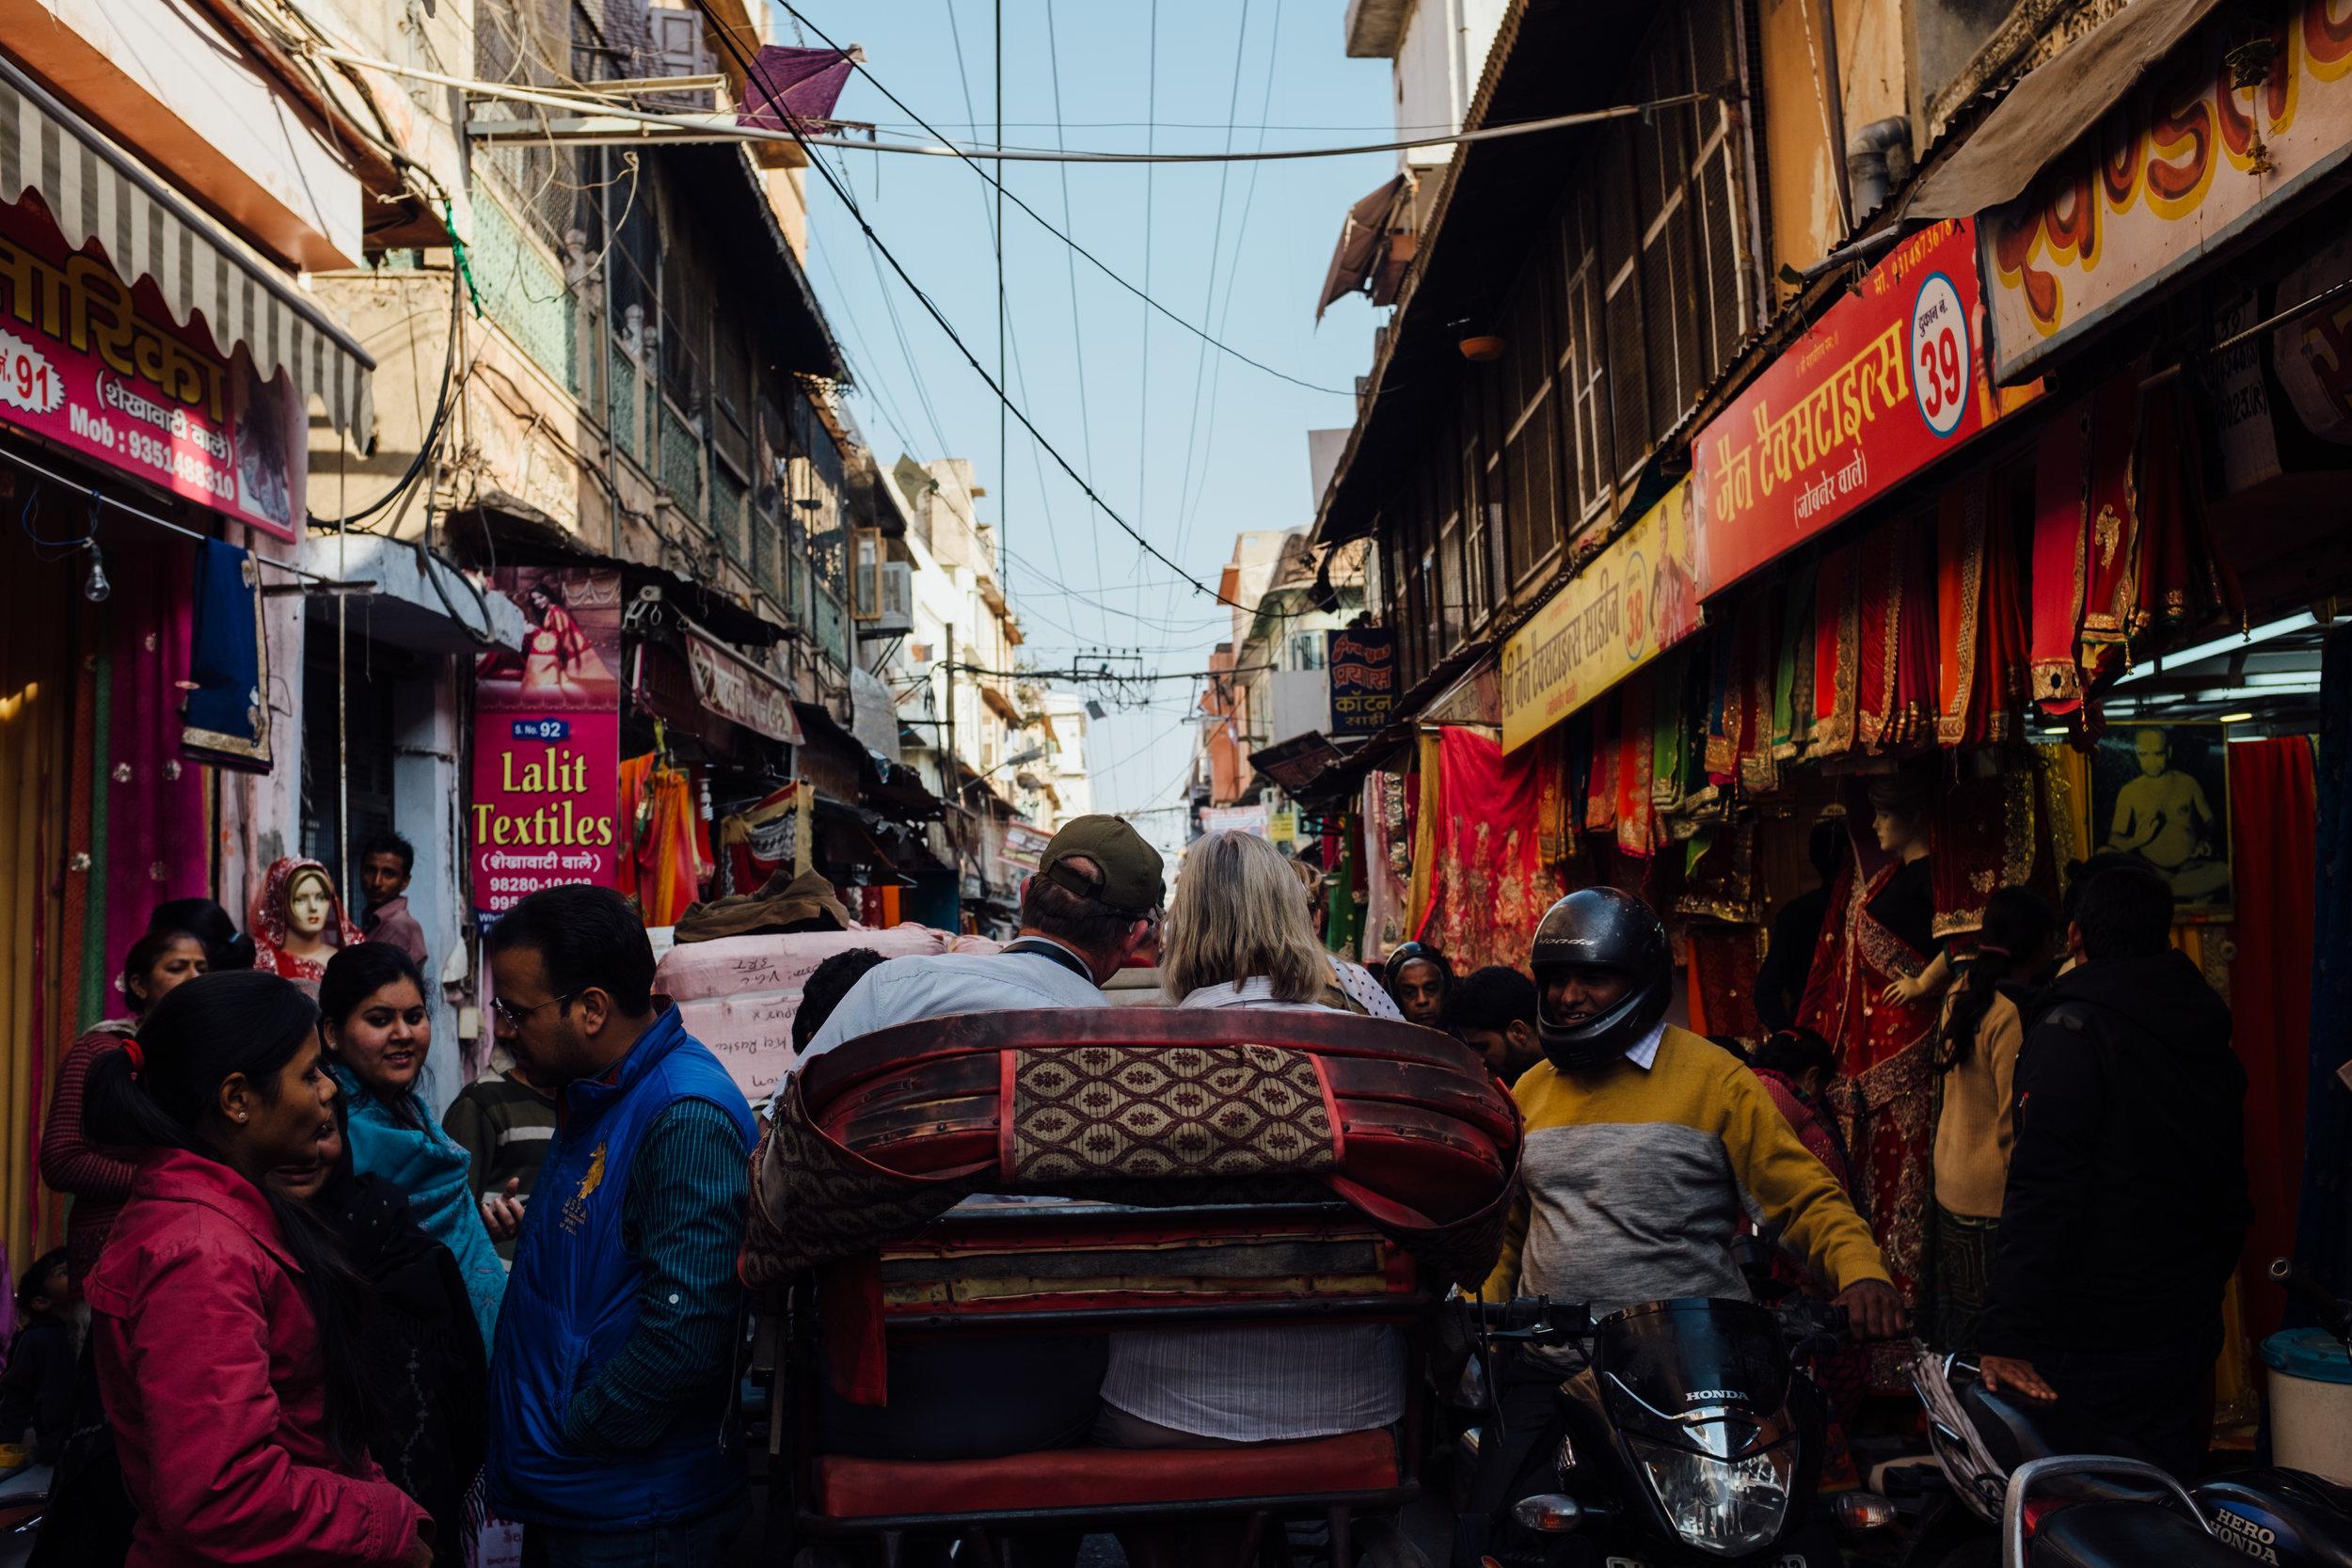 Rickshaw ride through the streets of Jaipur